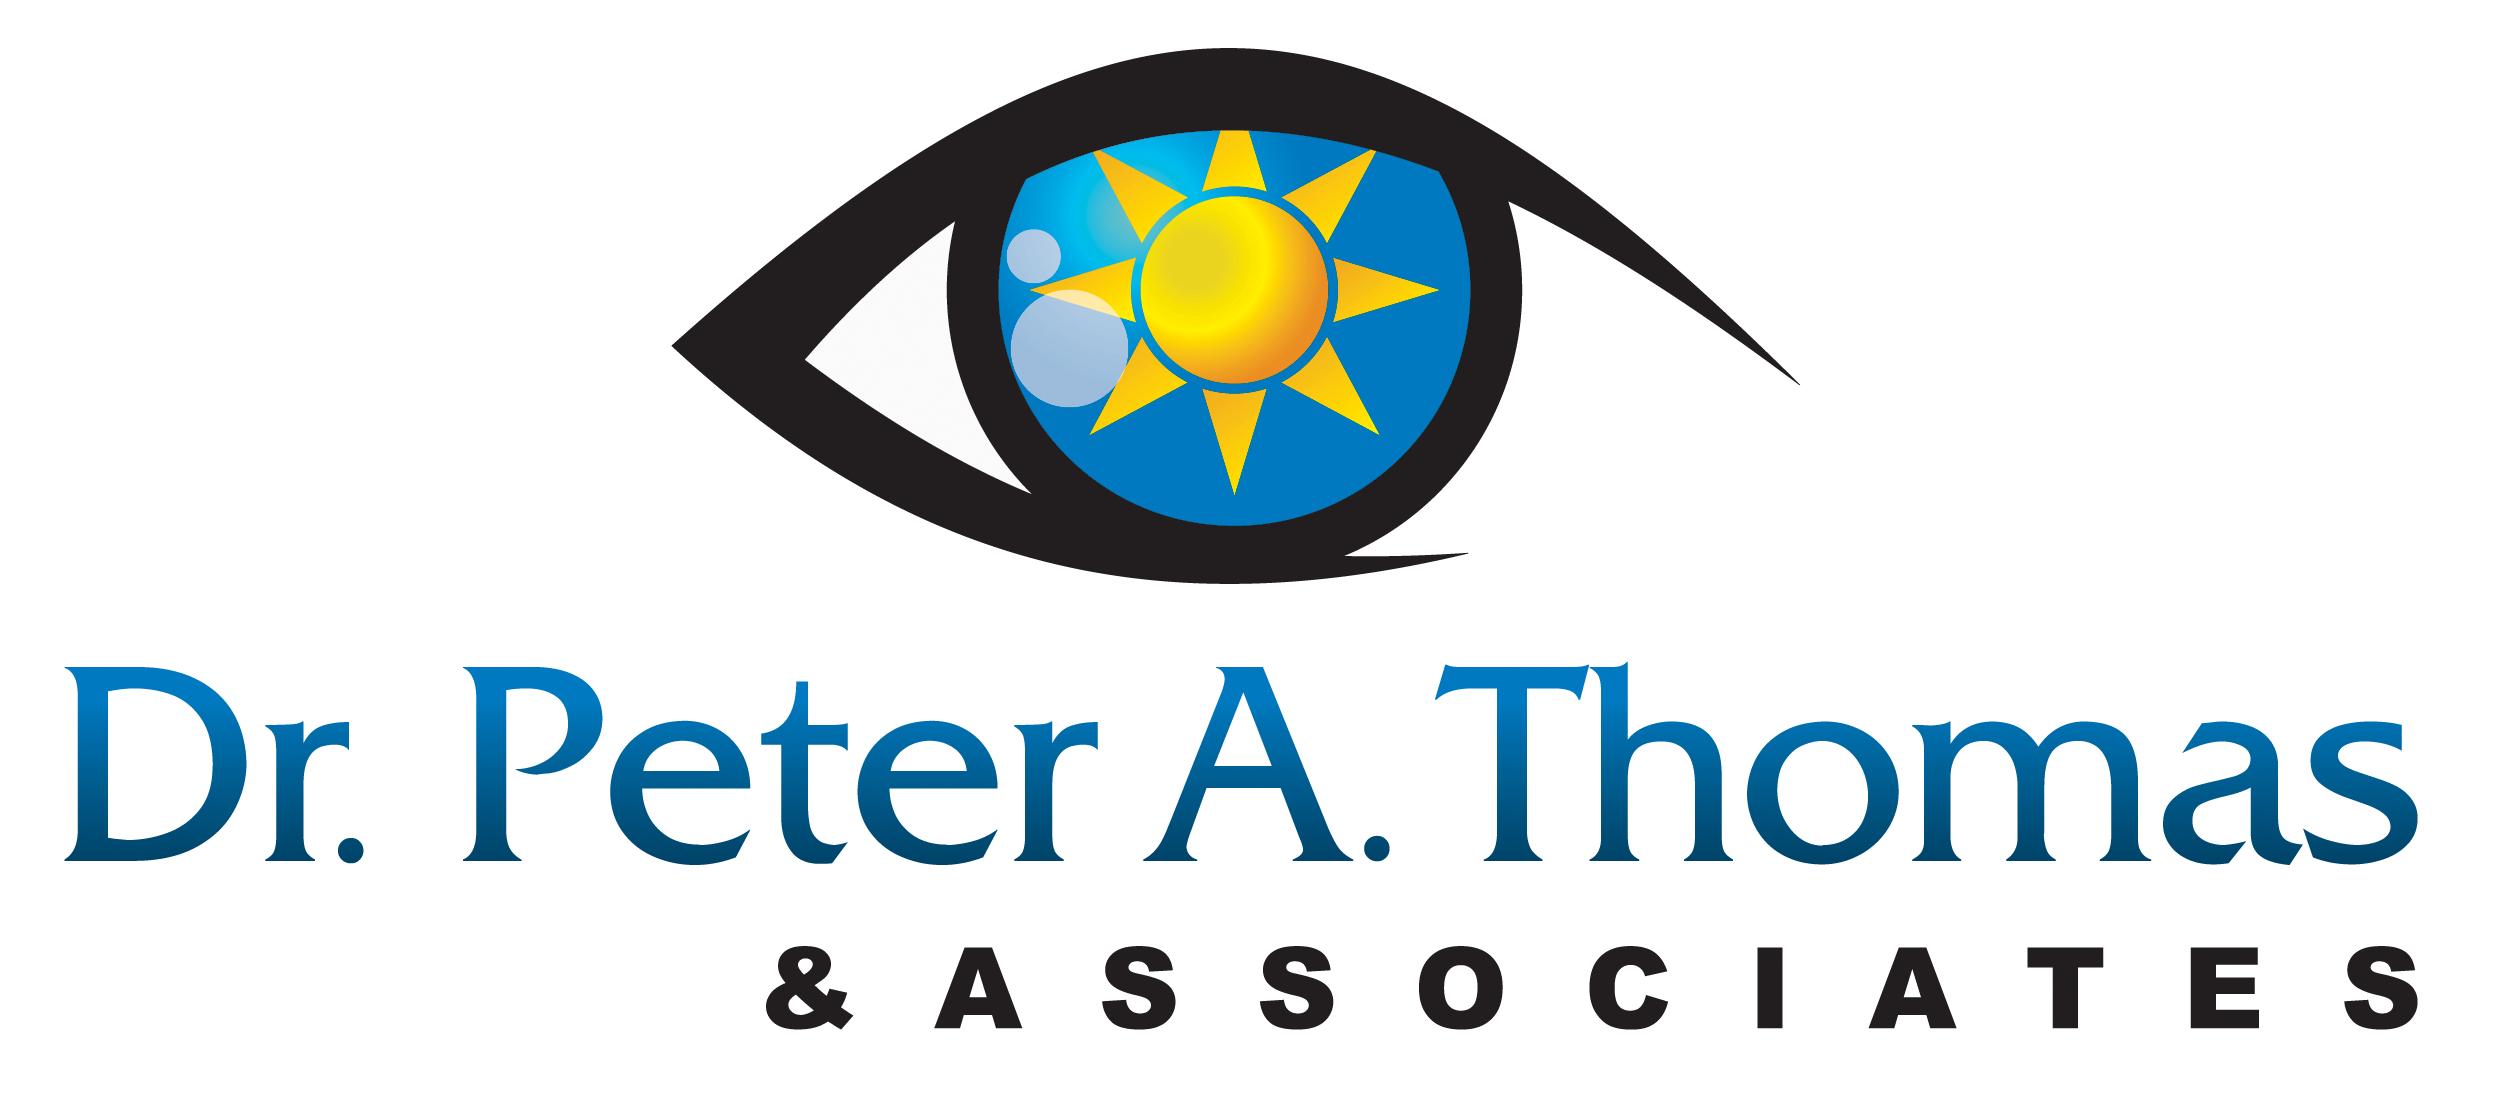 Dr. Peter A. Thomas & Associates, LLC